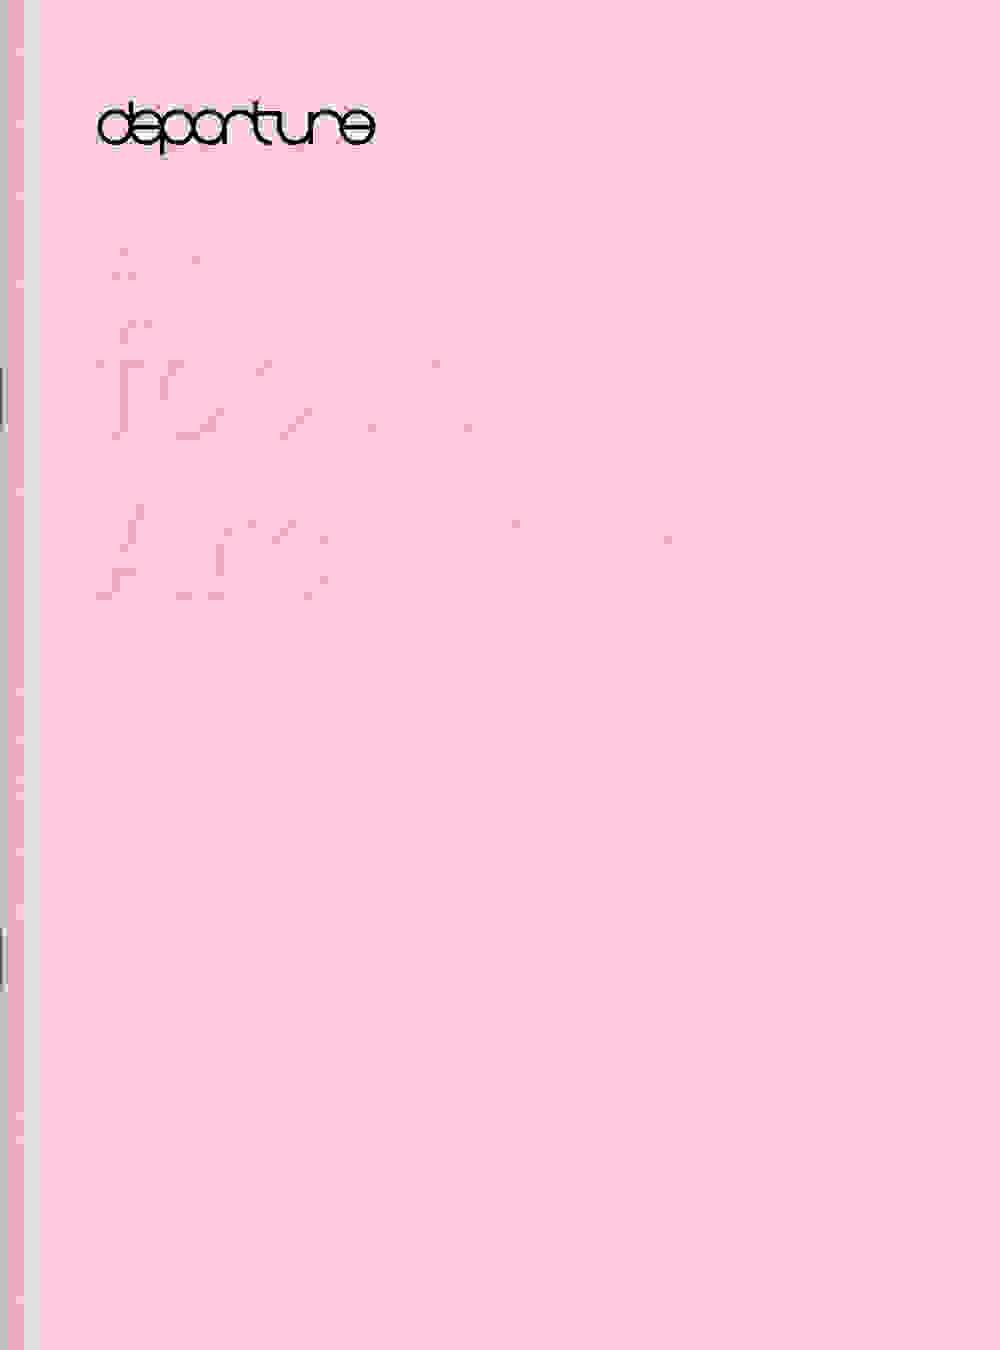 Dep whitepaper architektur 1000x1350 COVER